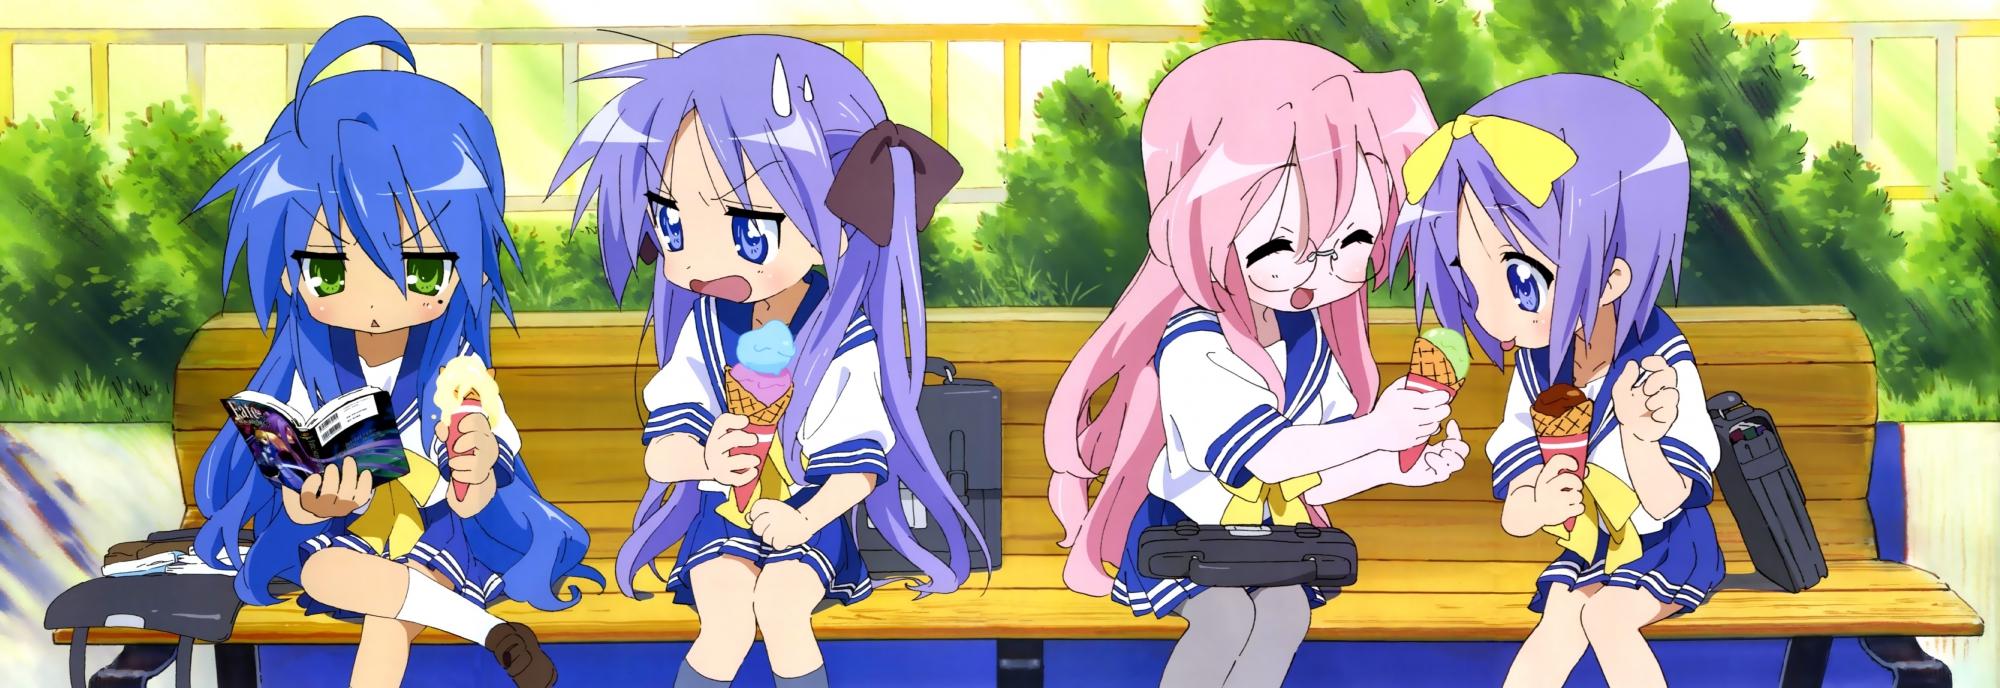 dualscreen hiiragi_kagami hiiragi_tsukasa izumi_konata lucky_star school_uniform takara_miyuki yamada_naoko